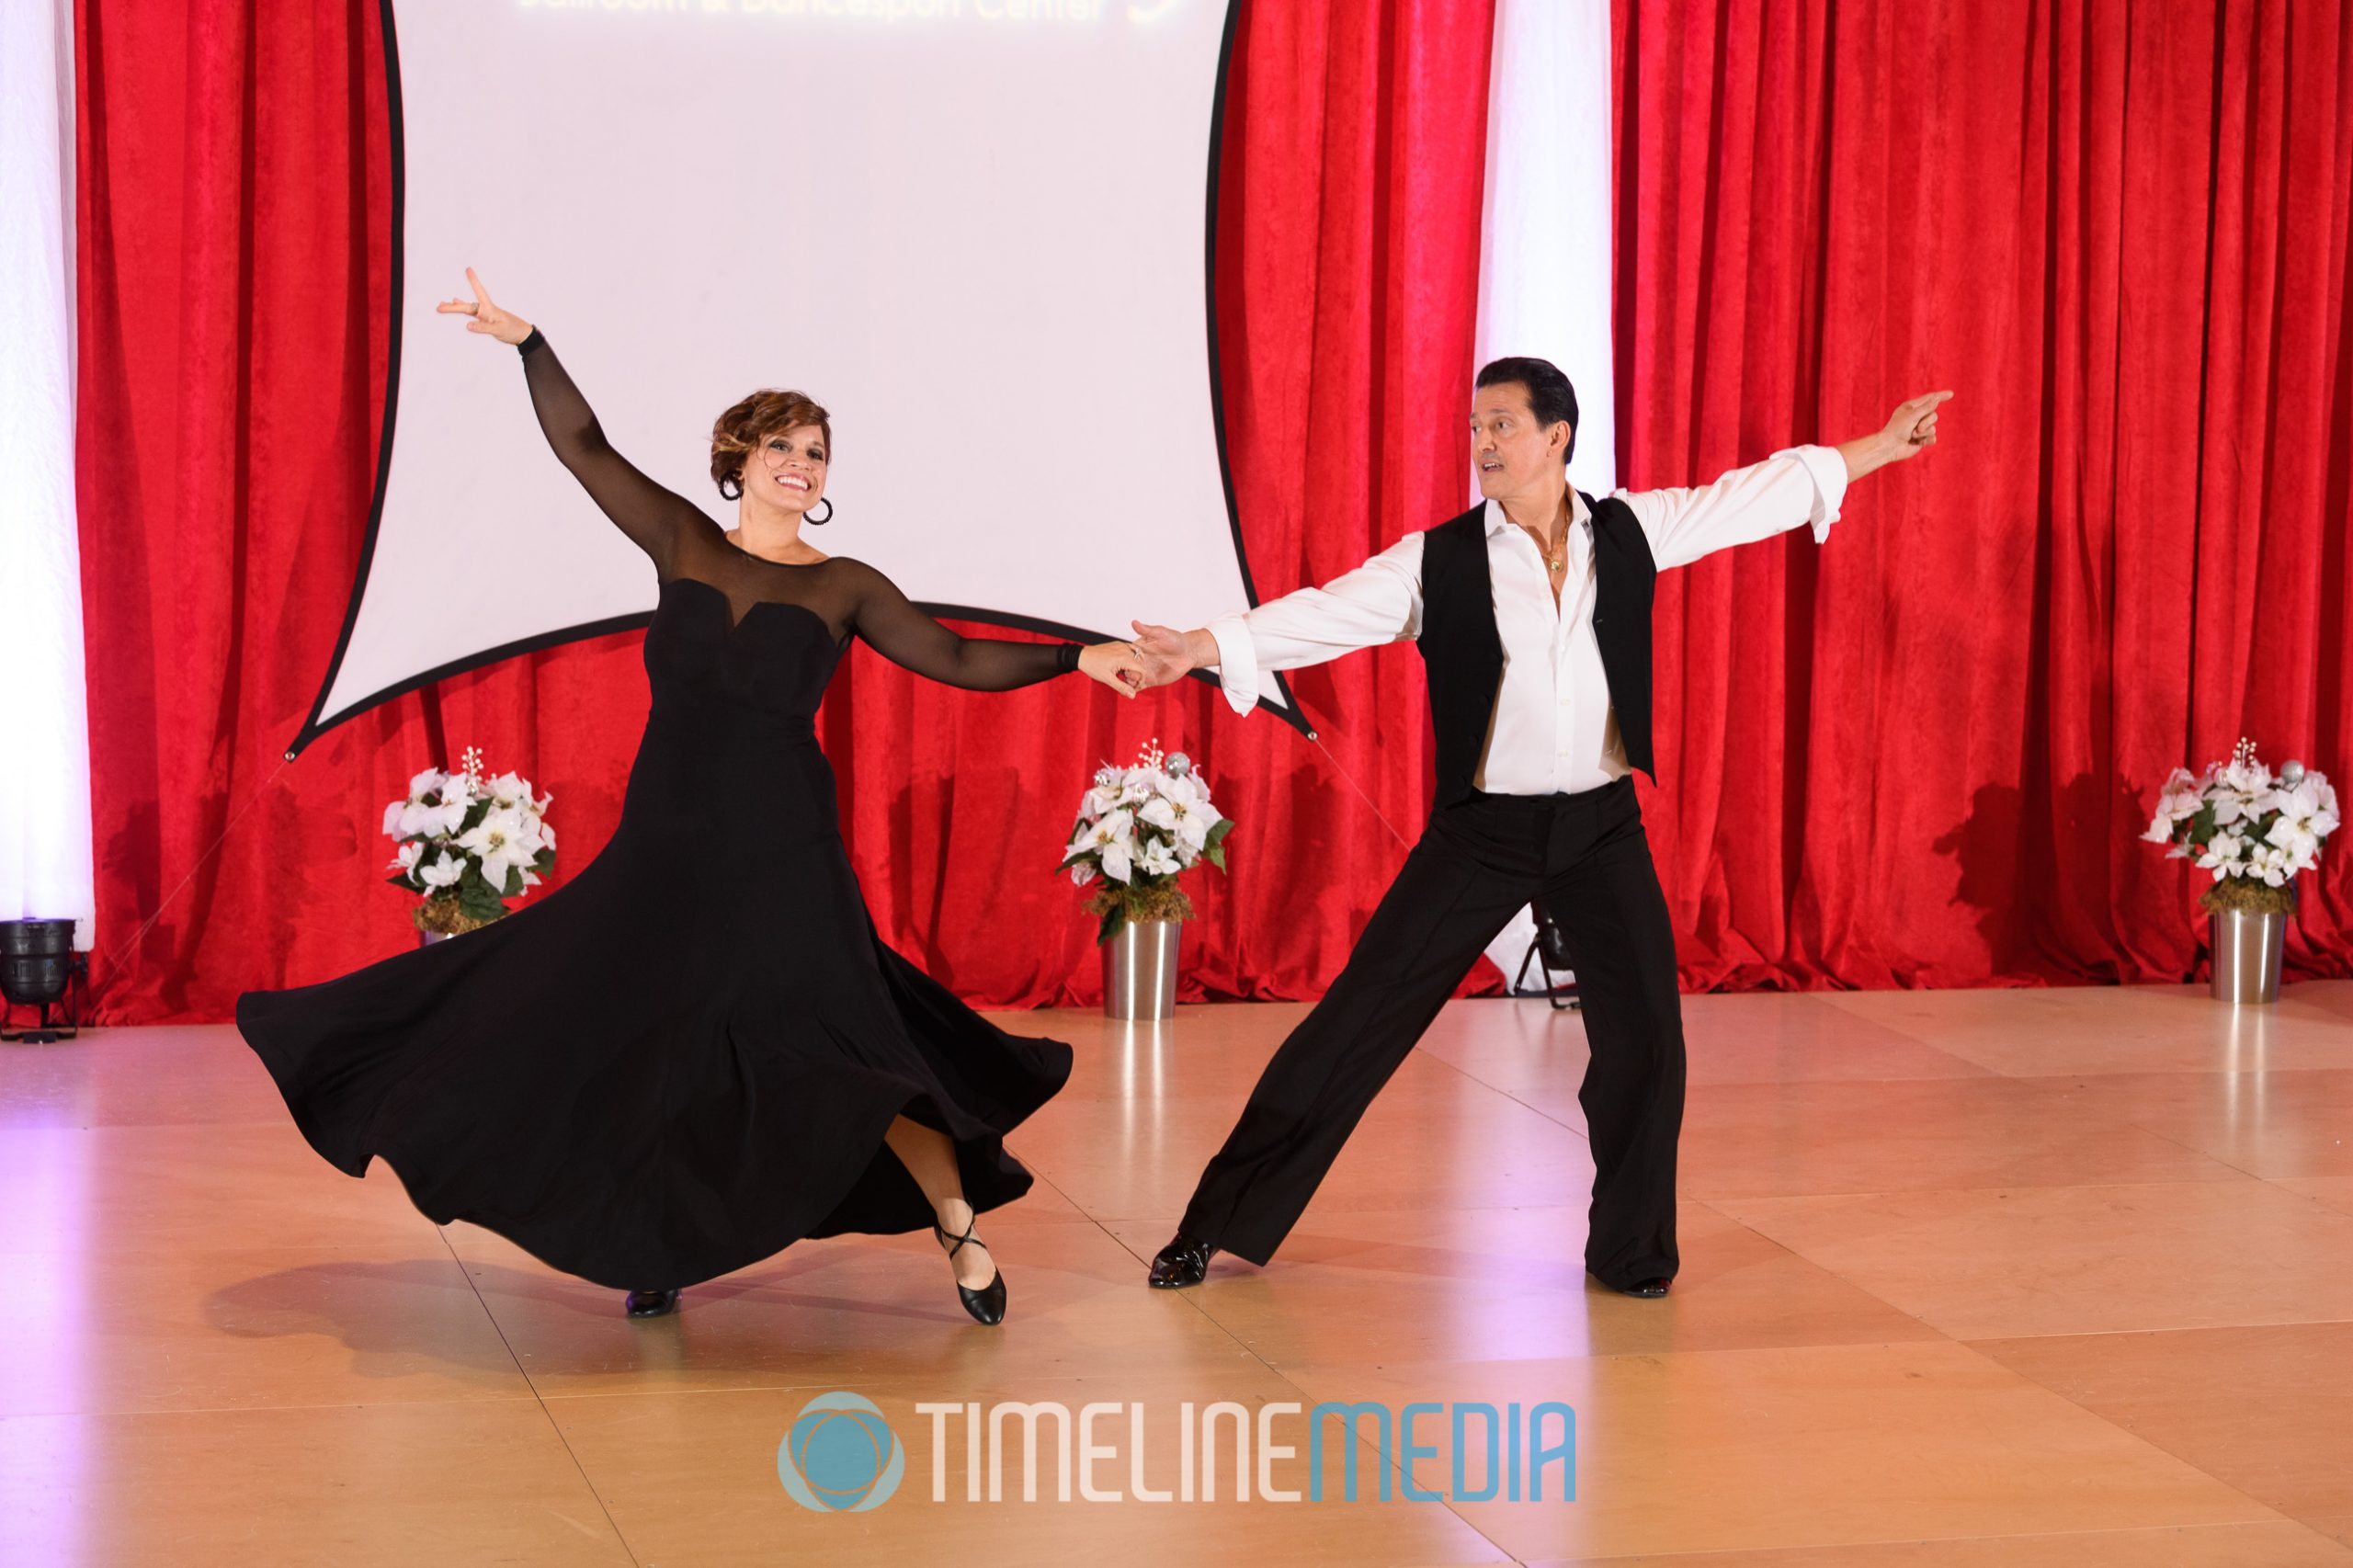 That's Dancing Ballroom staff show ©TimeLine Media